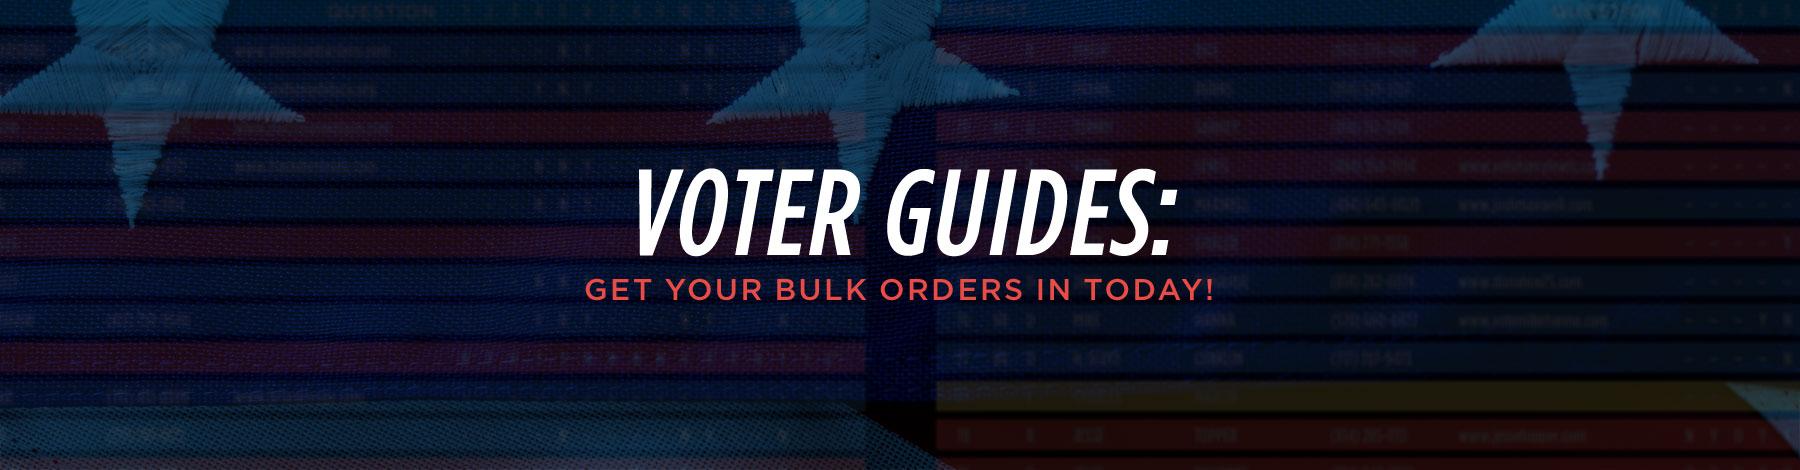 Bulk-Order-Voter-Guides-Blog-Graphic-9-19-14